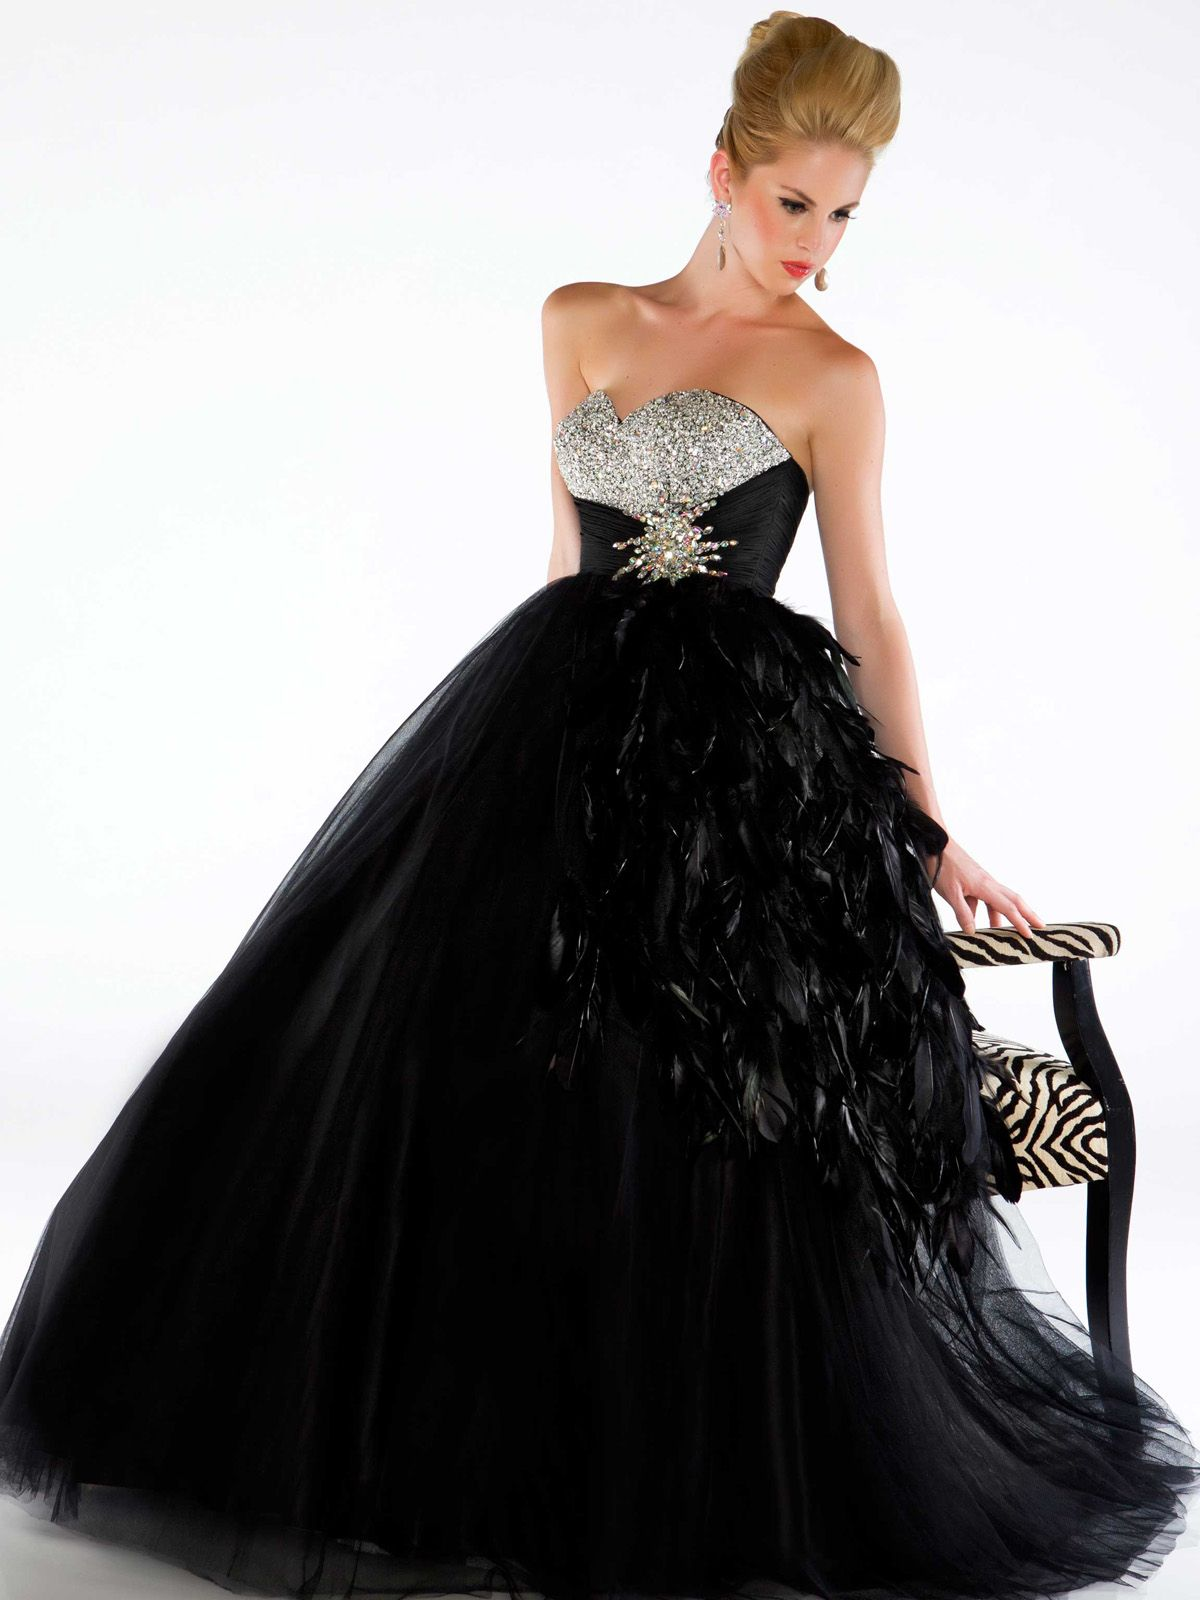 Black mac duggal sweetheart bodice ball gown h wedding